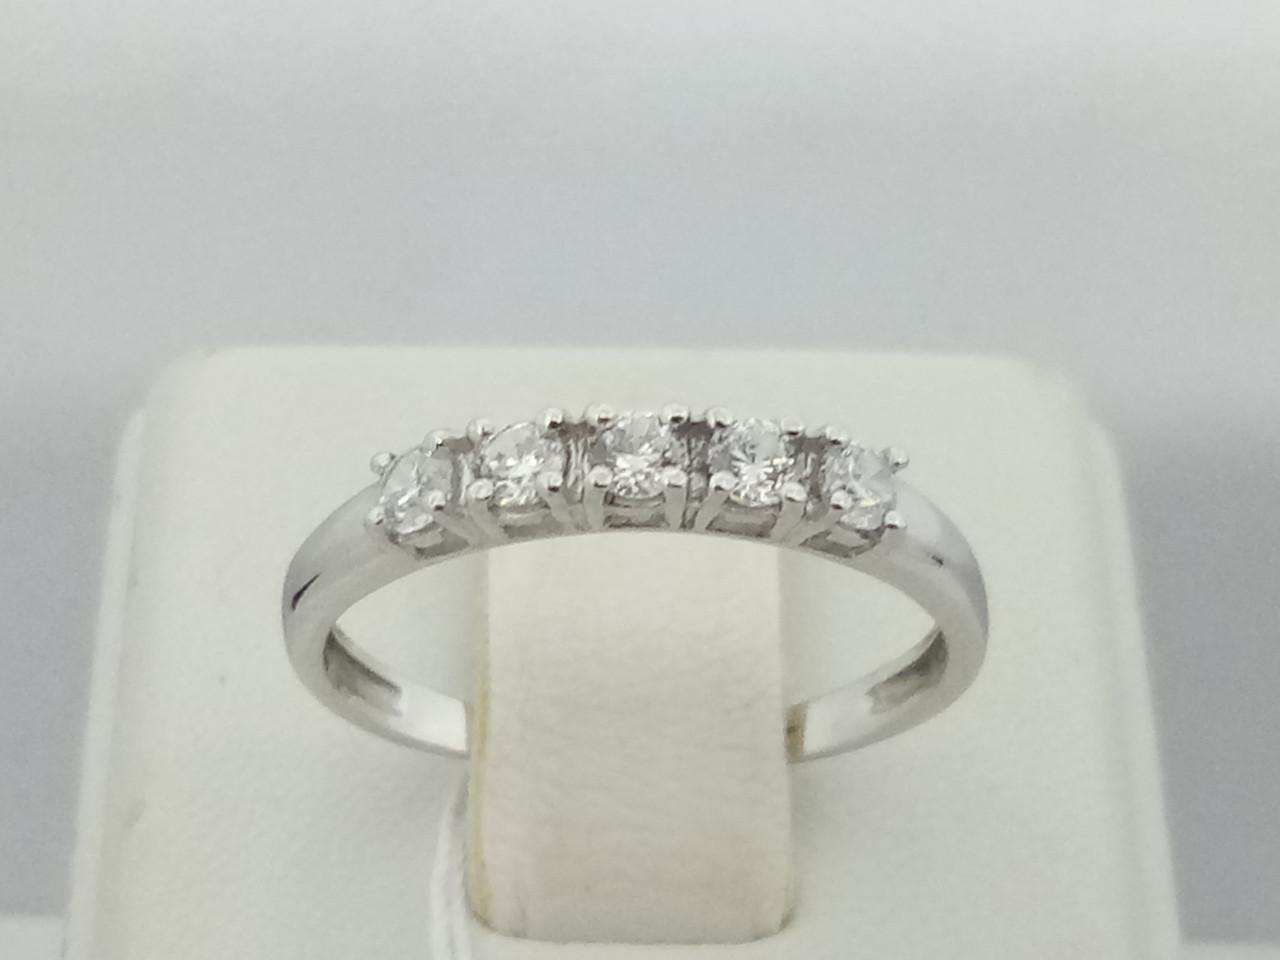 Серебряное кольцо Алькор с фианитами. Артикул 1318/1Р-CZ 17